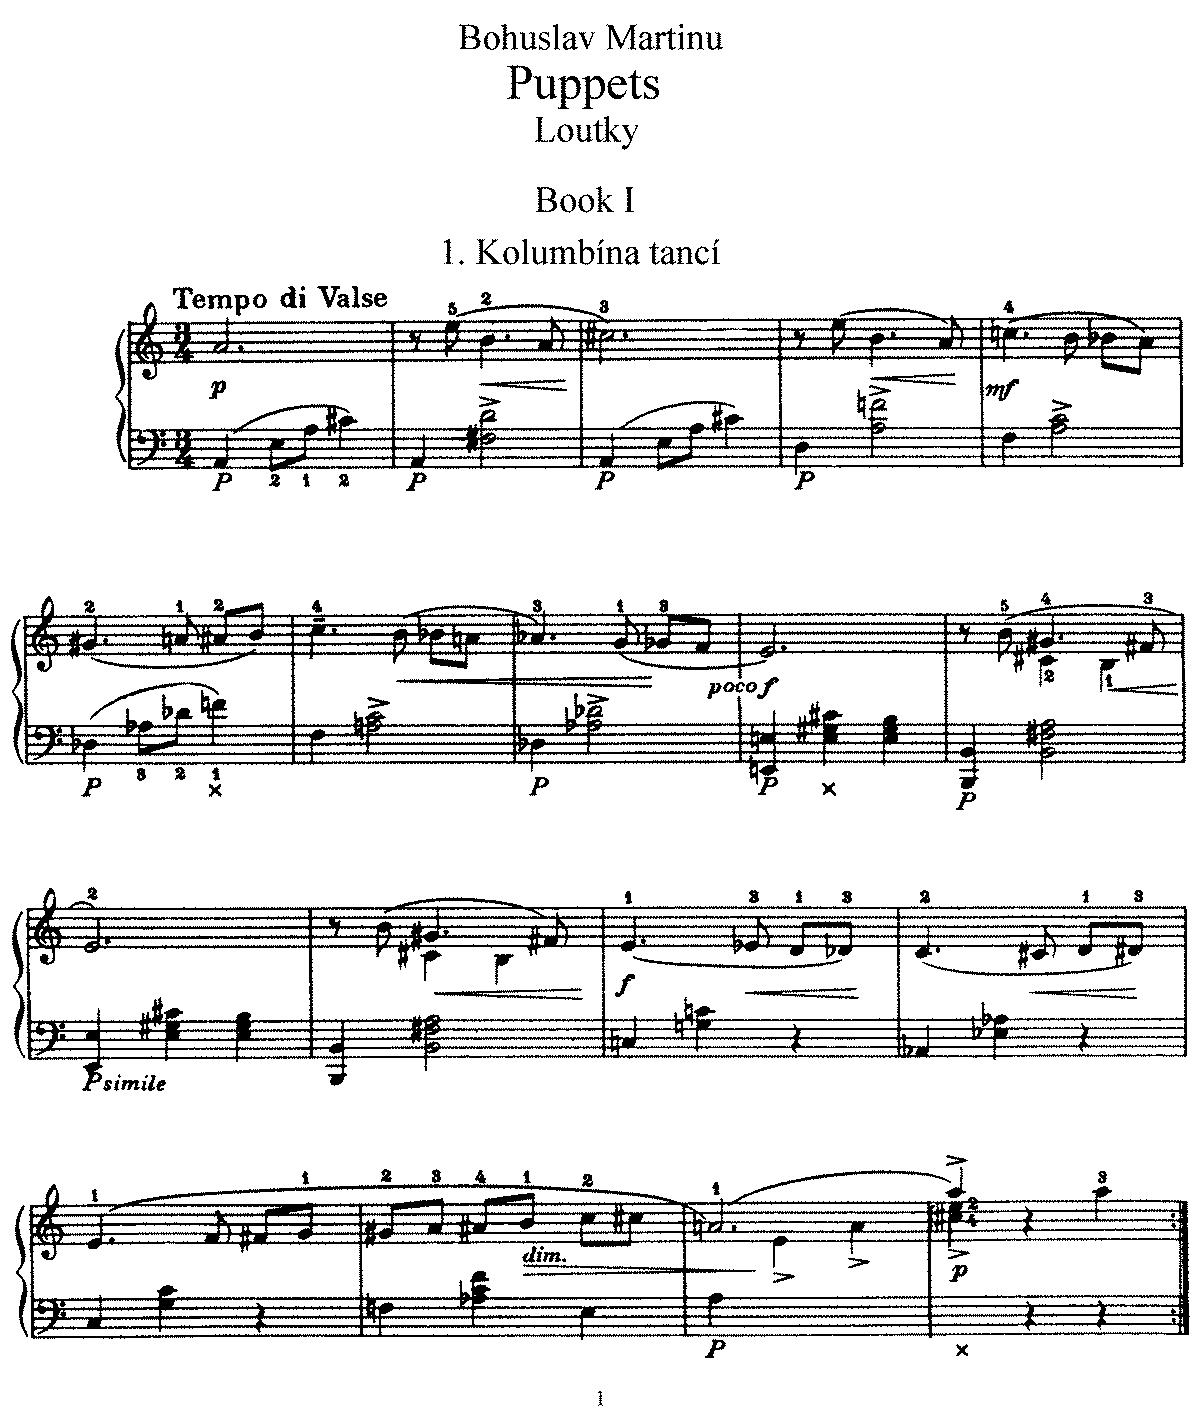 Free Sheet Music Public Domain: IMSLP/Petrucci Music Library